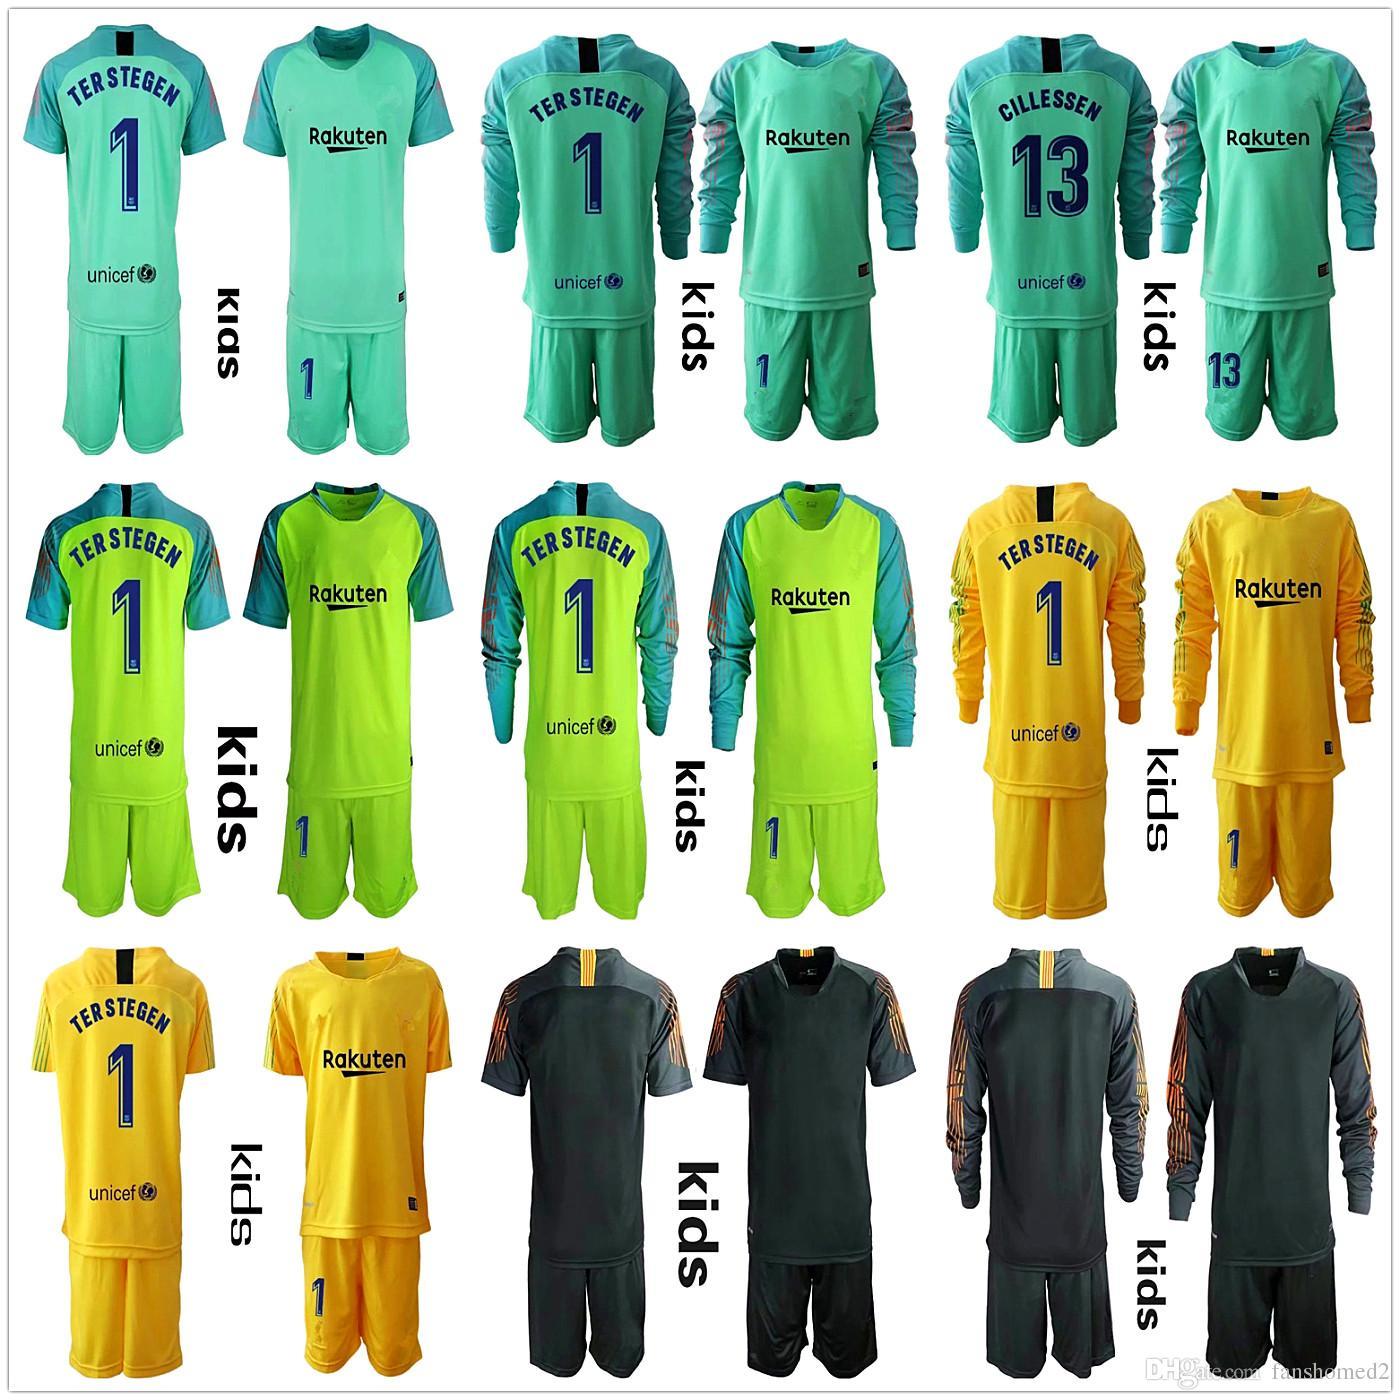 2732f5787d7 2019 2018 2019 Youth Long Ter Stegen Goalkeeper Jerseys Kids Kit Soccer  Sets  1 Ter Stegen Kid Boy Goalkeeper Jersey 18 19 Children Uniform Sets  From ...